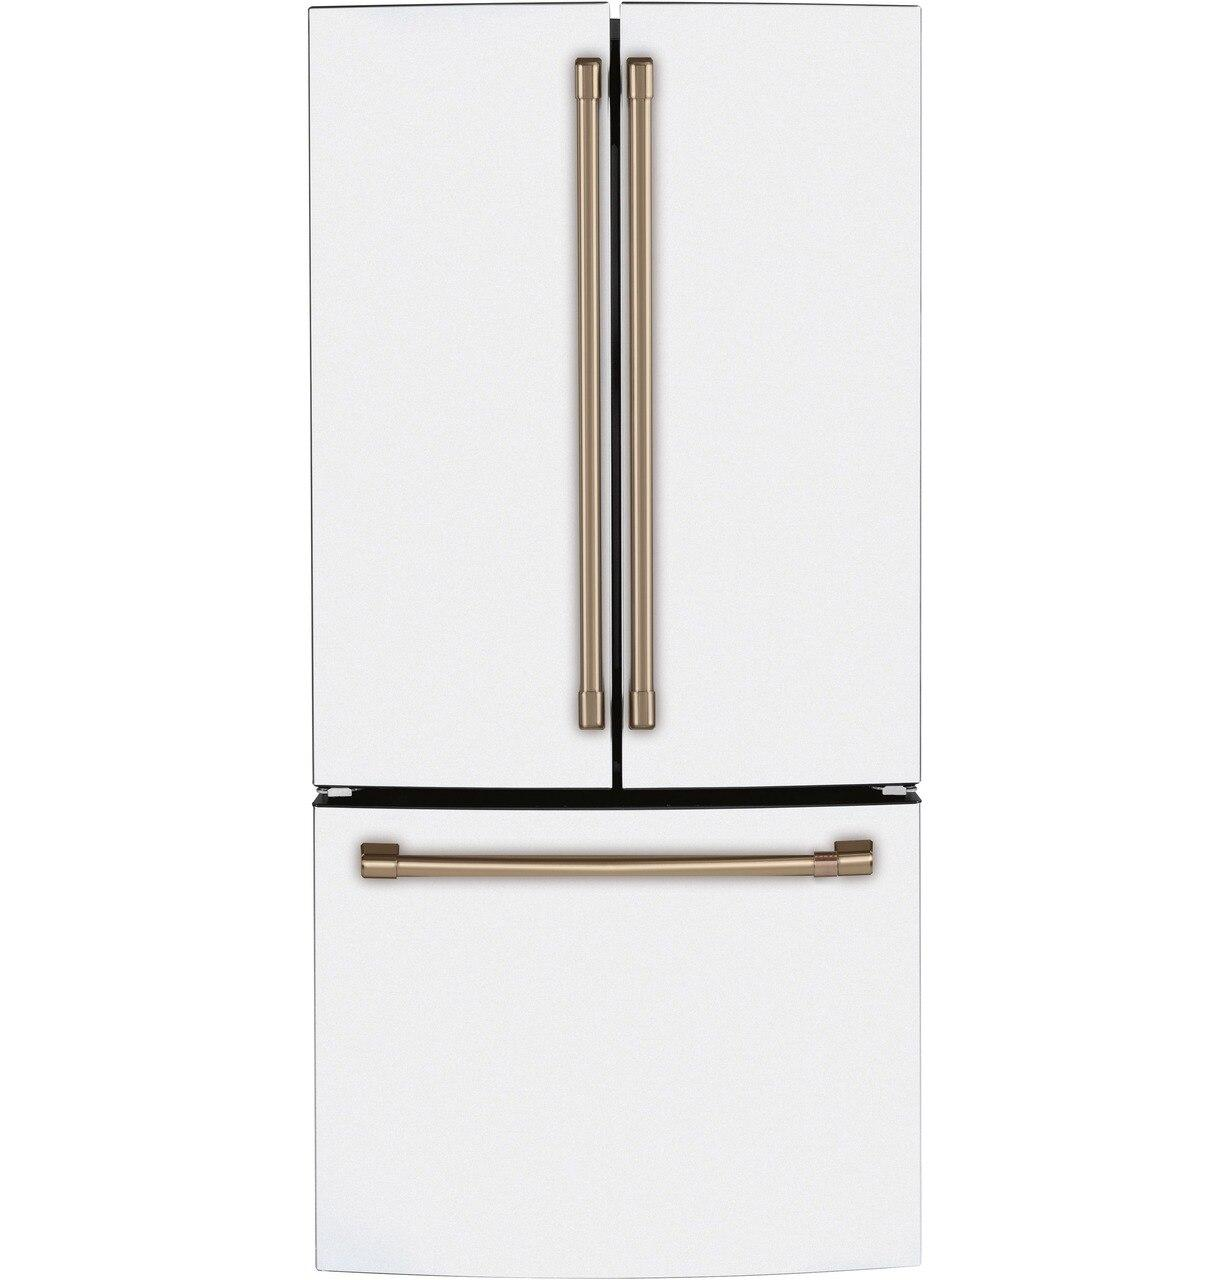 Cafe AppliancesCafe™ Energy Star® 18.6 Cu. Ft. Counter-Depth French-Door Refrigerator